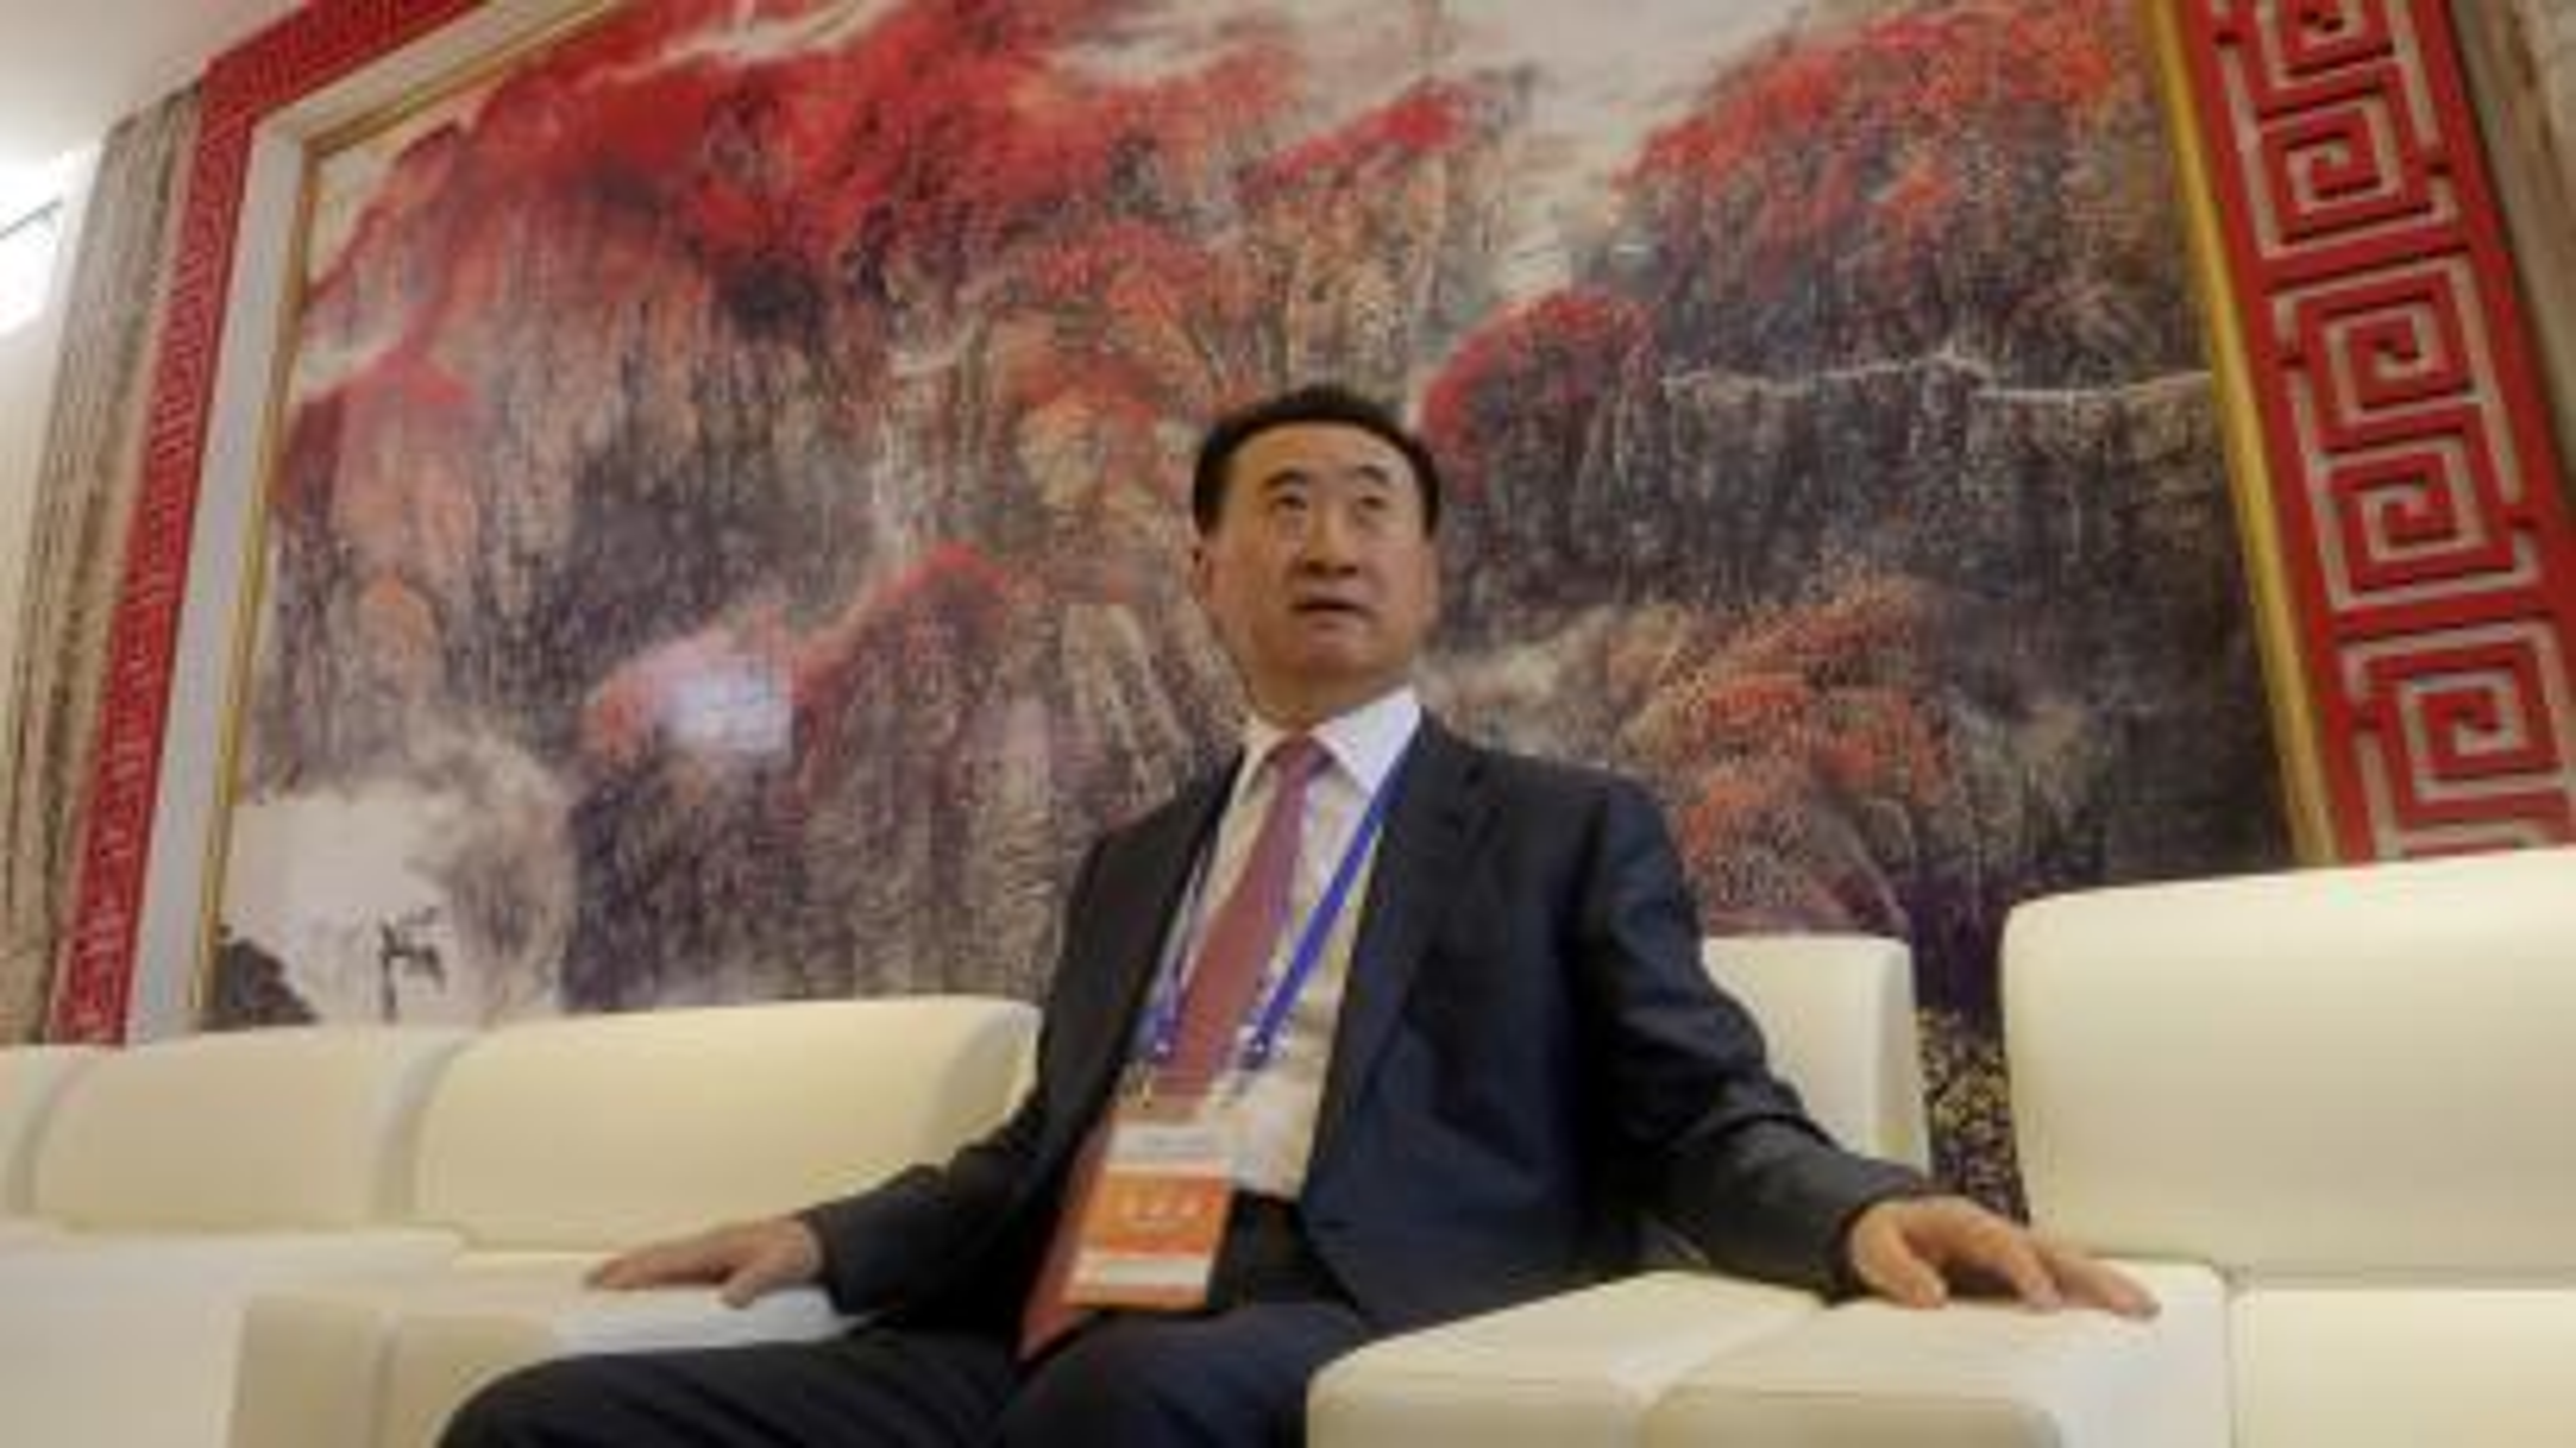 China's richest man, Wanda Group CEO Wang Jianlin, has